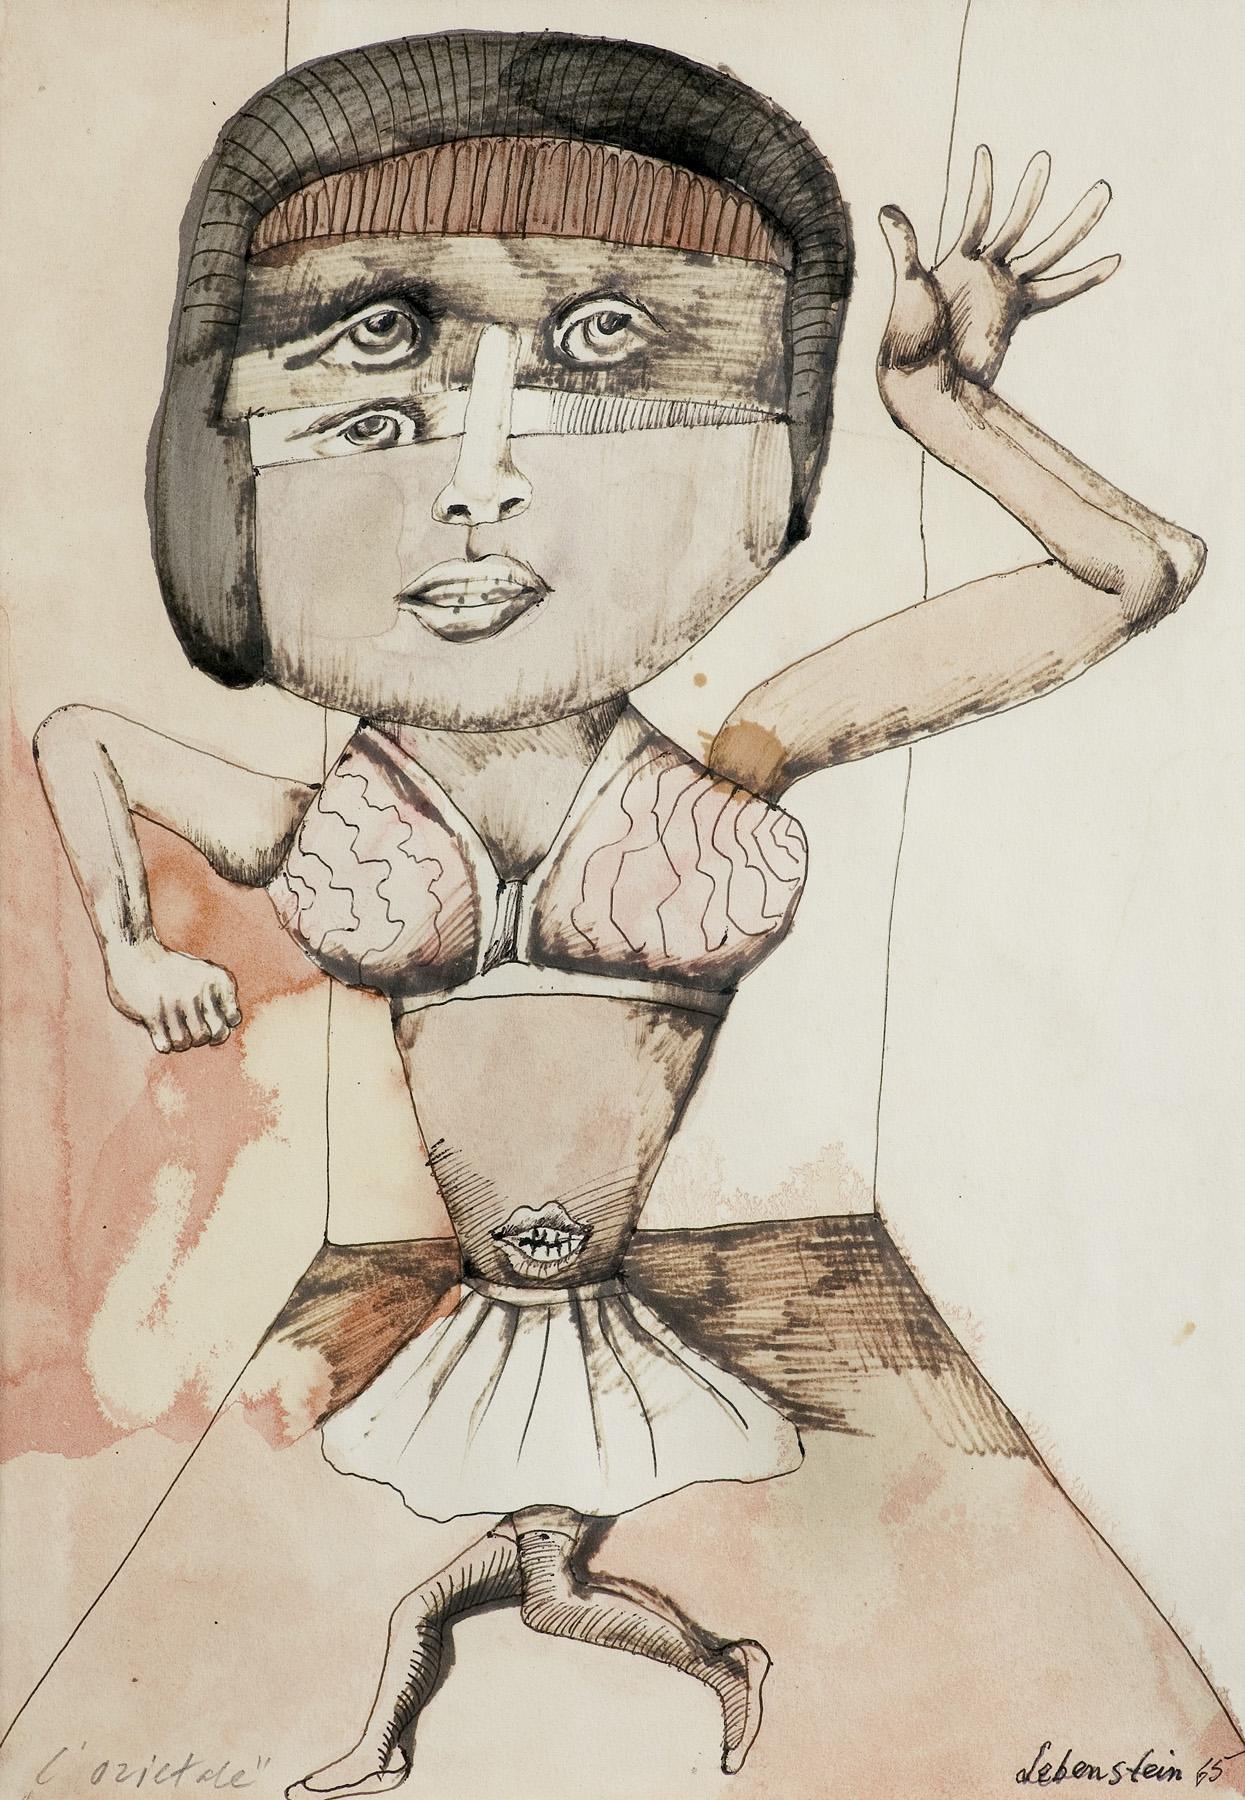 L'ORIETALE (ORIENTALE?), 1965